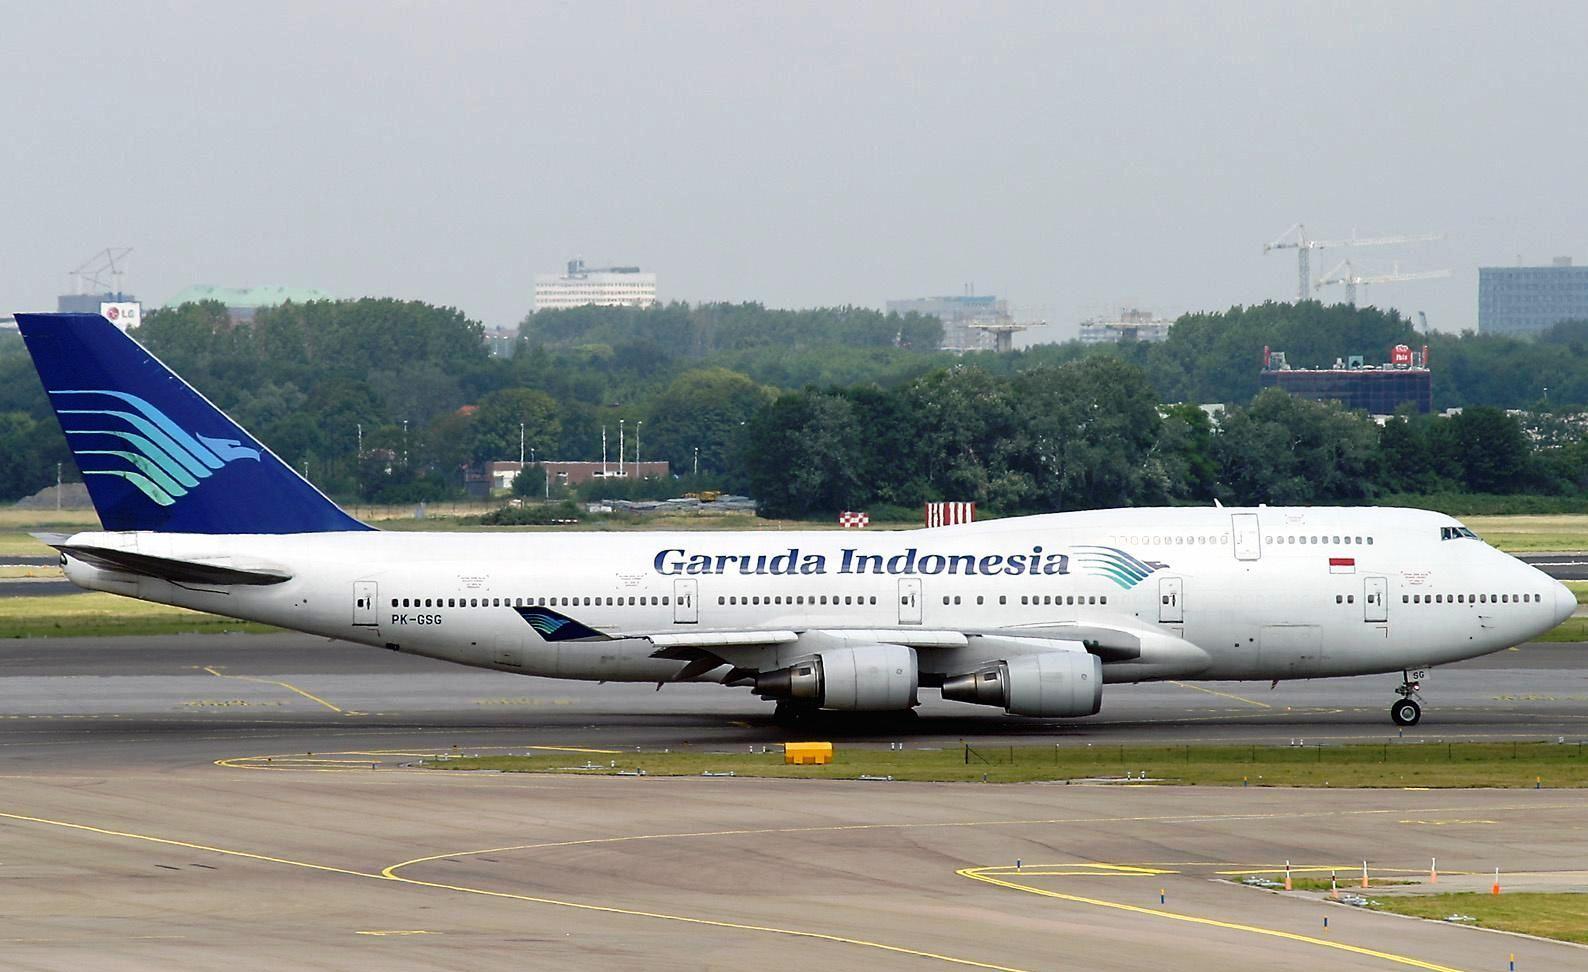 http://2.bp.blogspot.com/-EGtcHl2Uo2Y/Tp2JiAesgGI/AAAAAAAAGcQ/wyR6GCv-8jI/s1600/garuda_indonesia_boeing_747-400.jpg